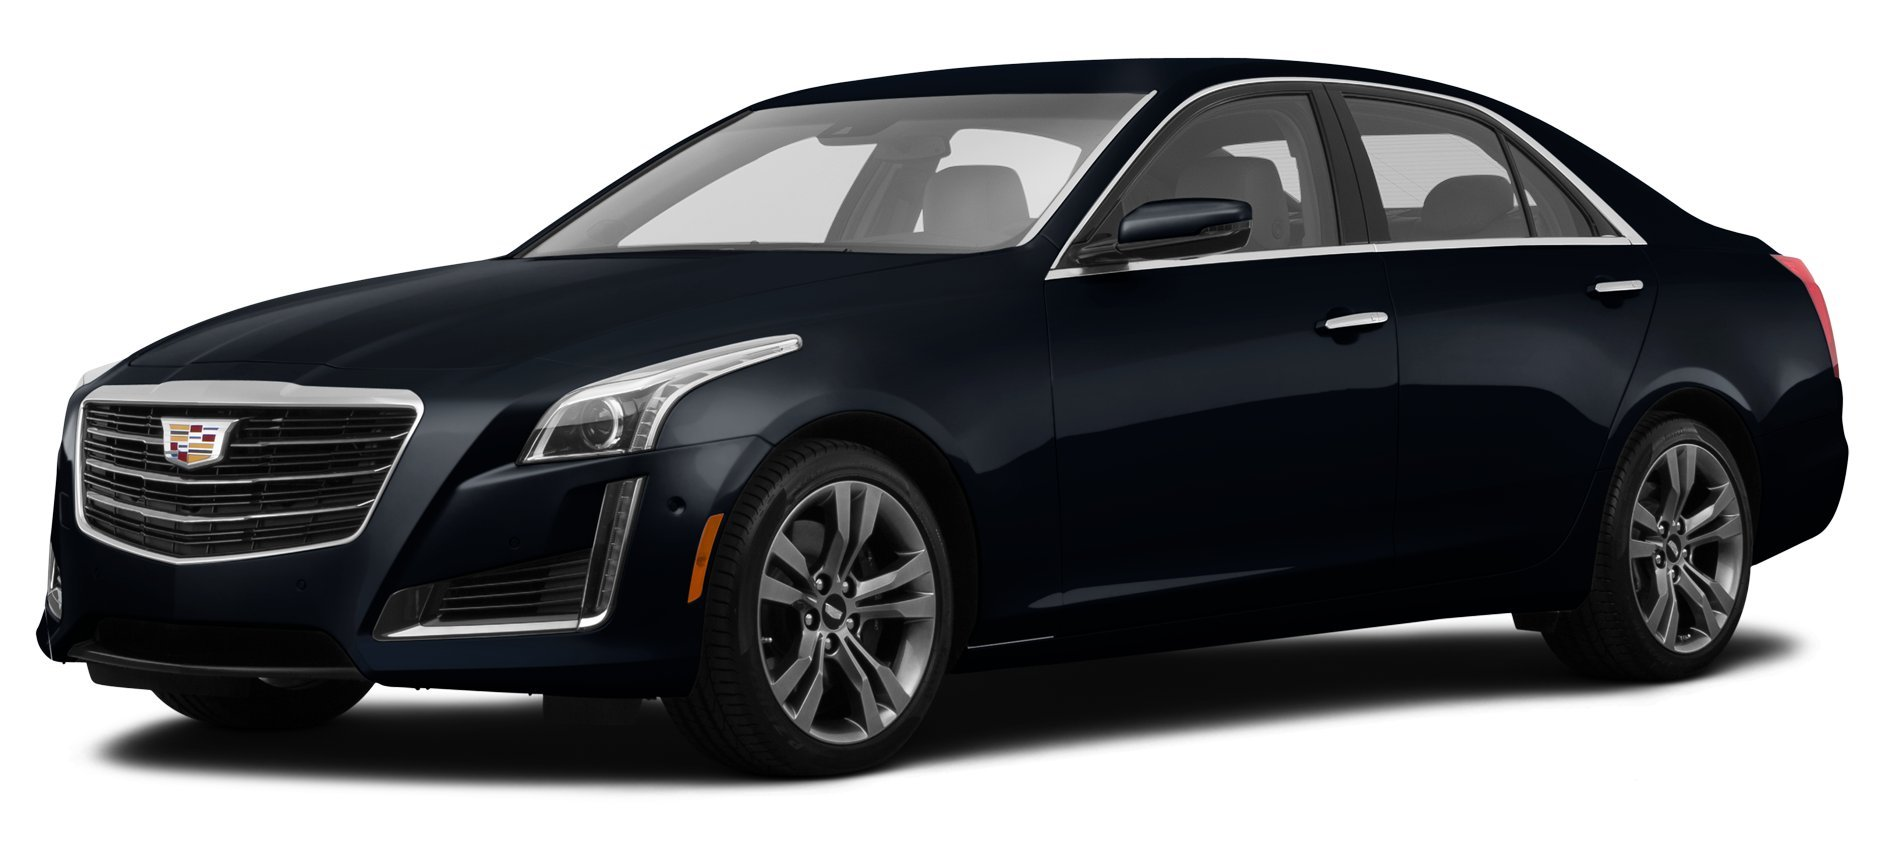 2015 tesla s reviews images and specs vehicles. Black Bedroom Furniture Sets. Home Design Ideas